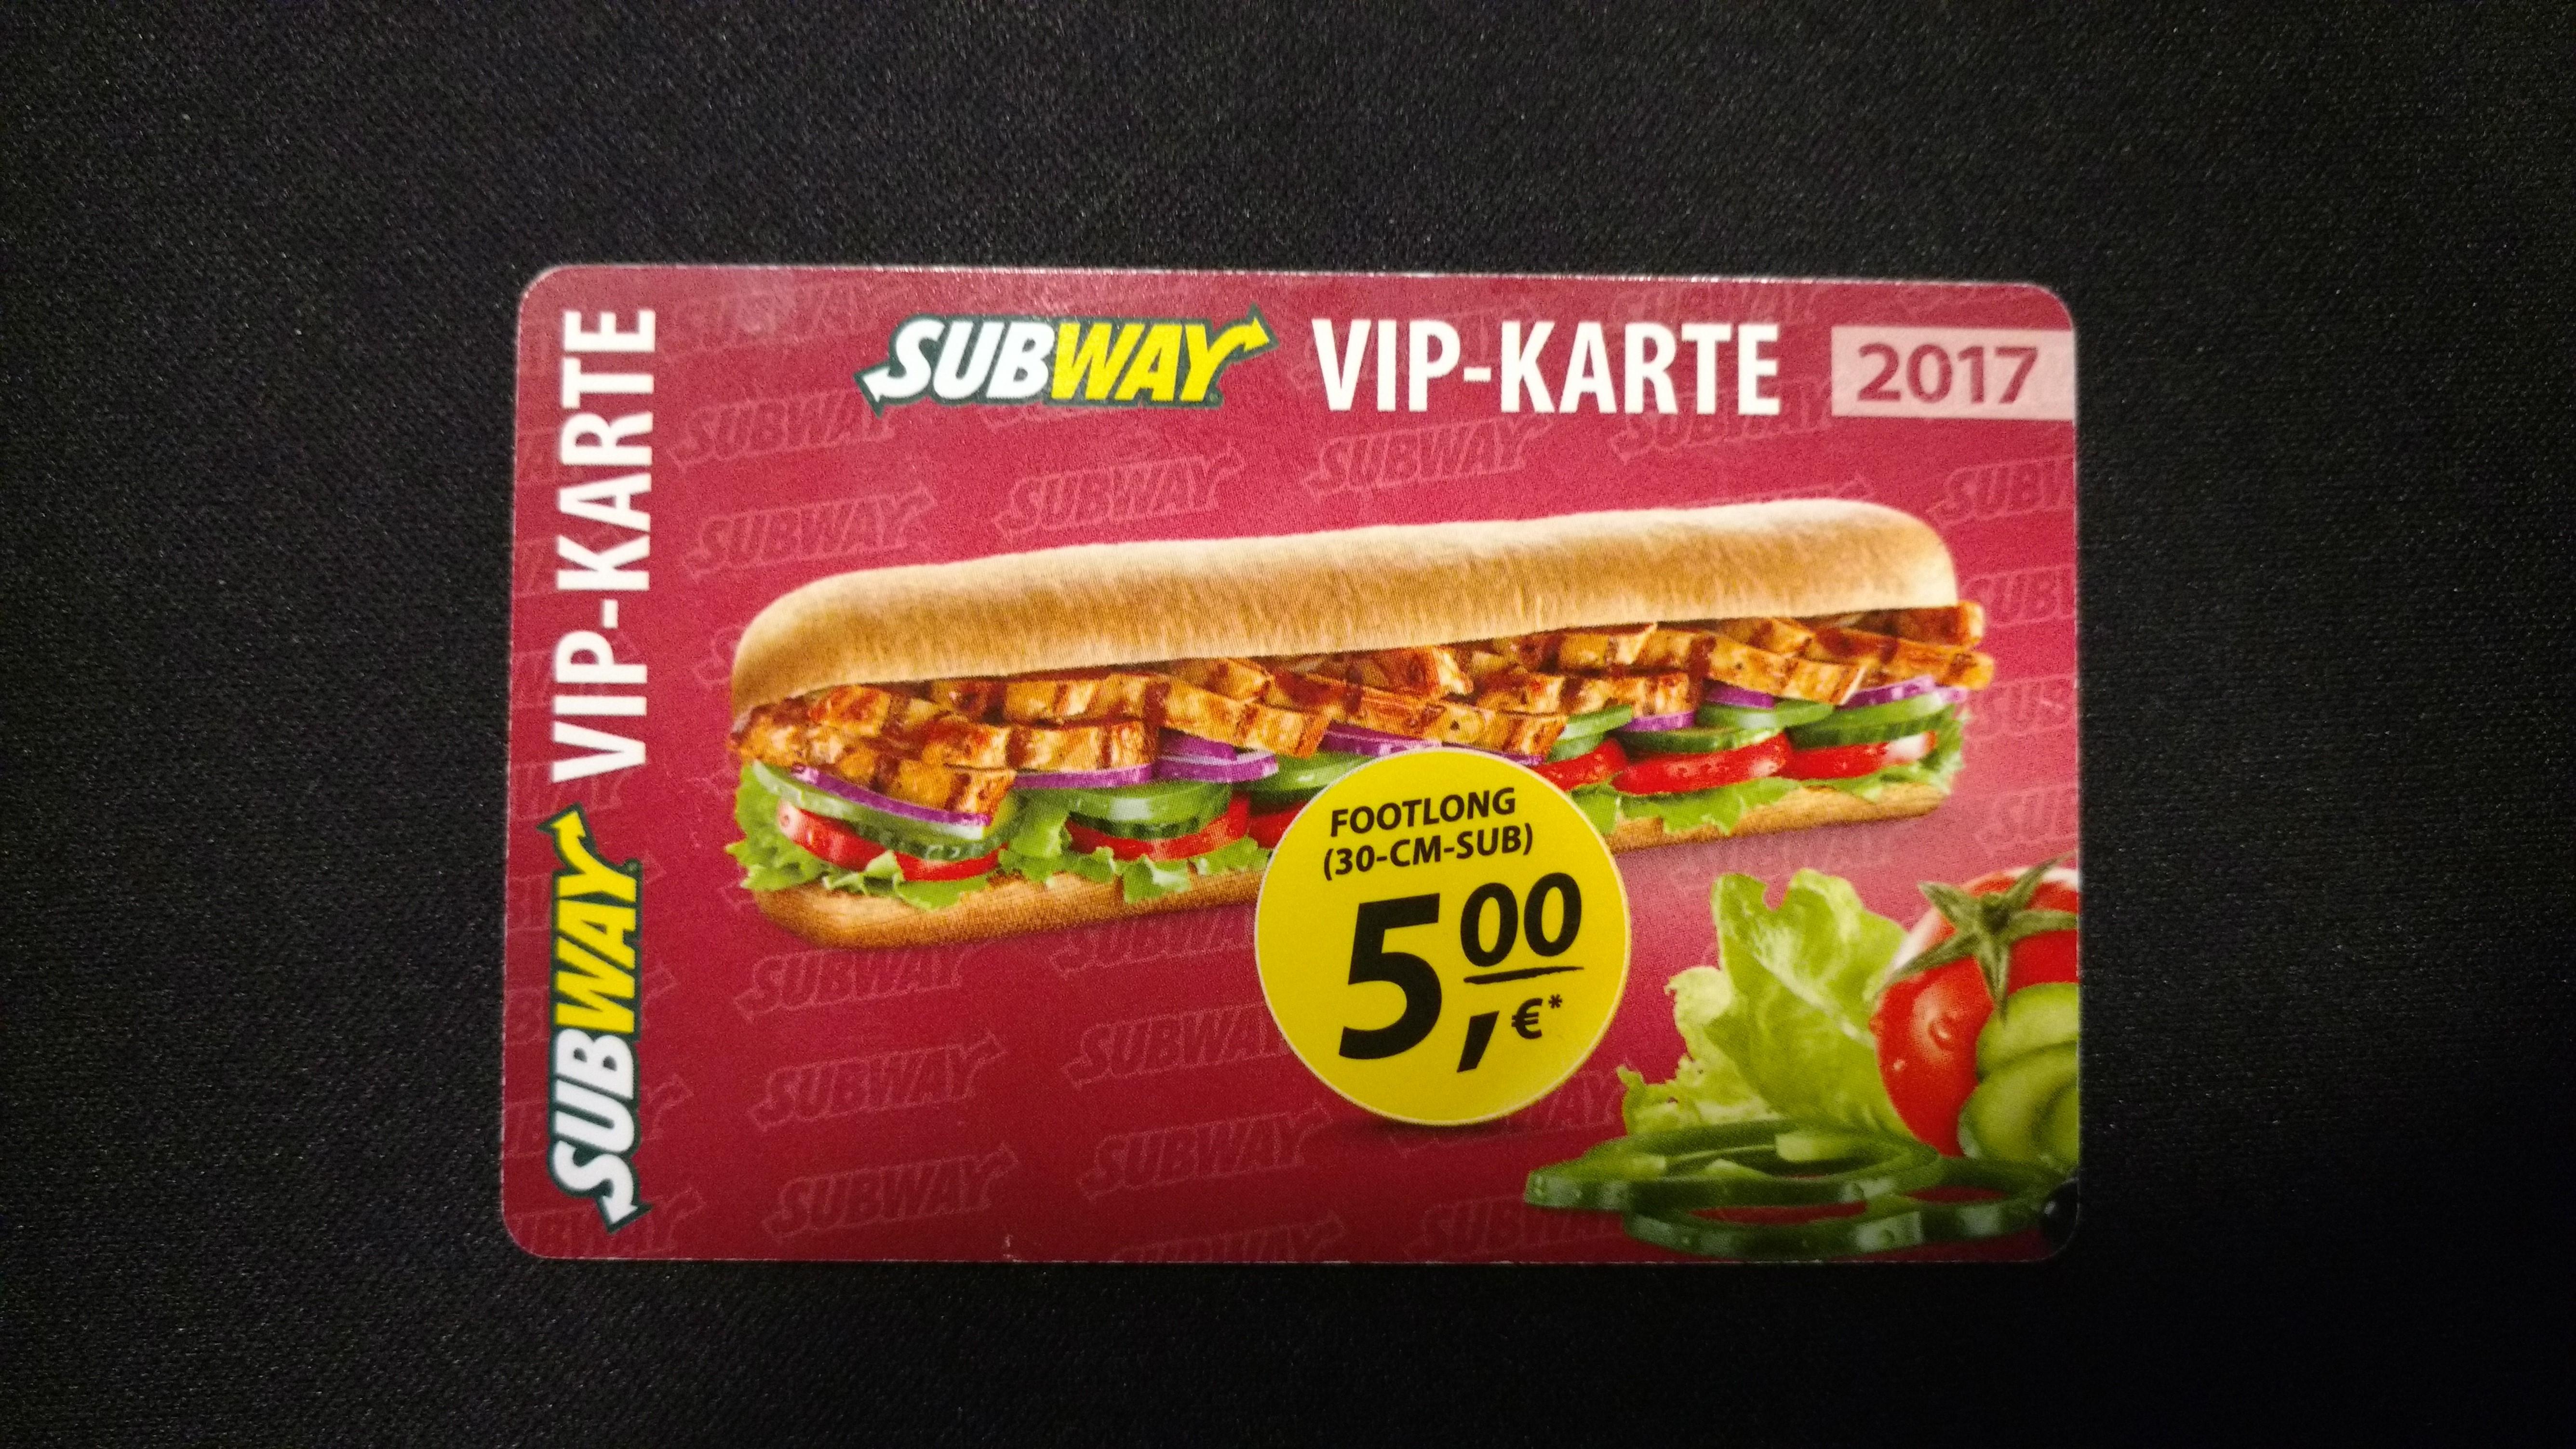 (Lokal Bayern) Subway VIP-Karte